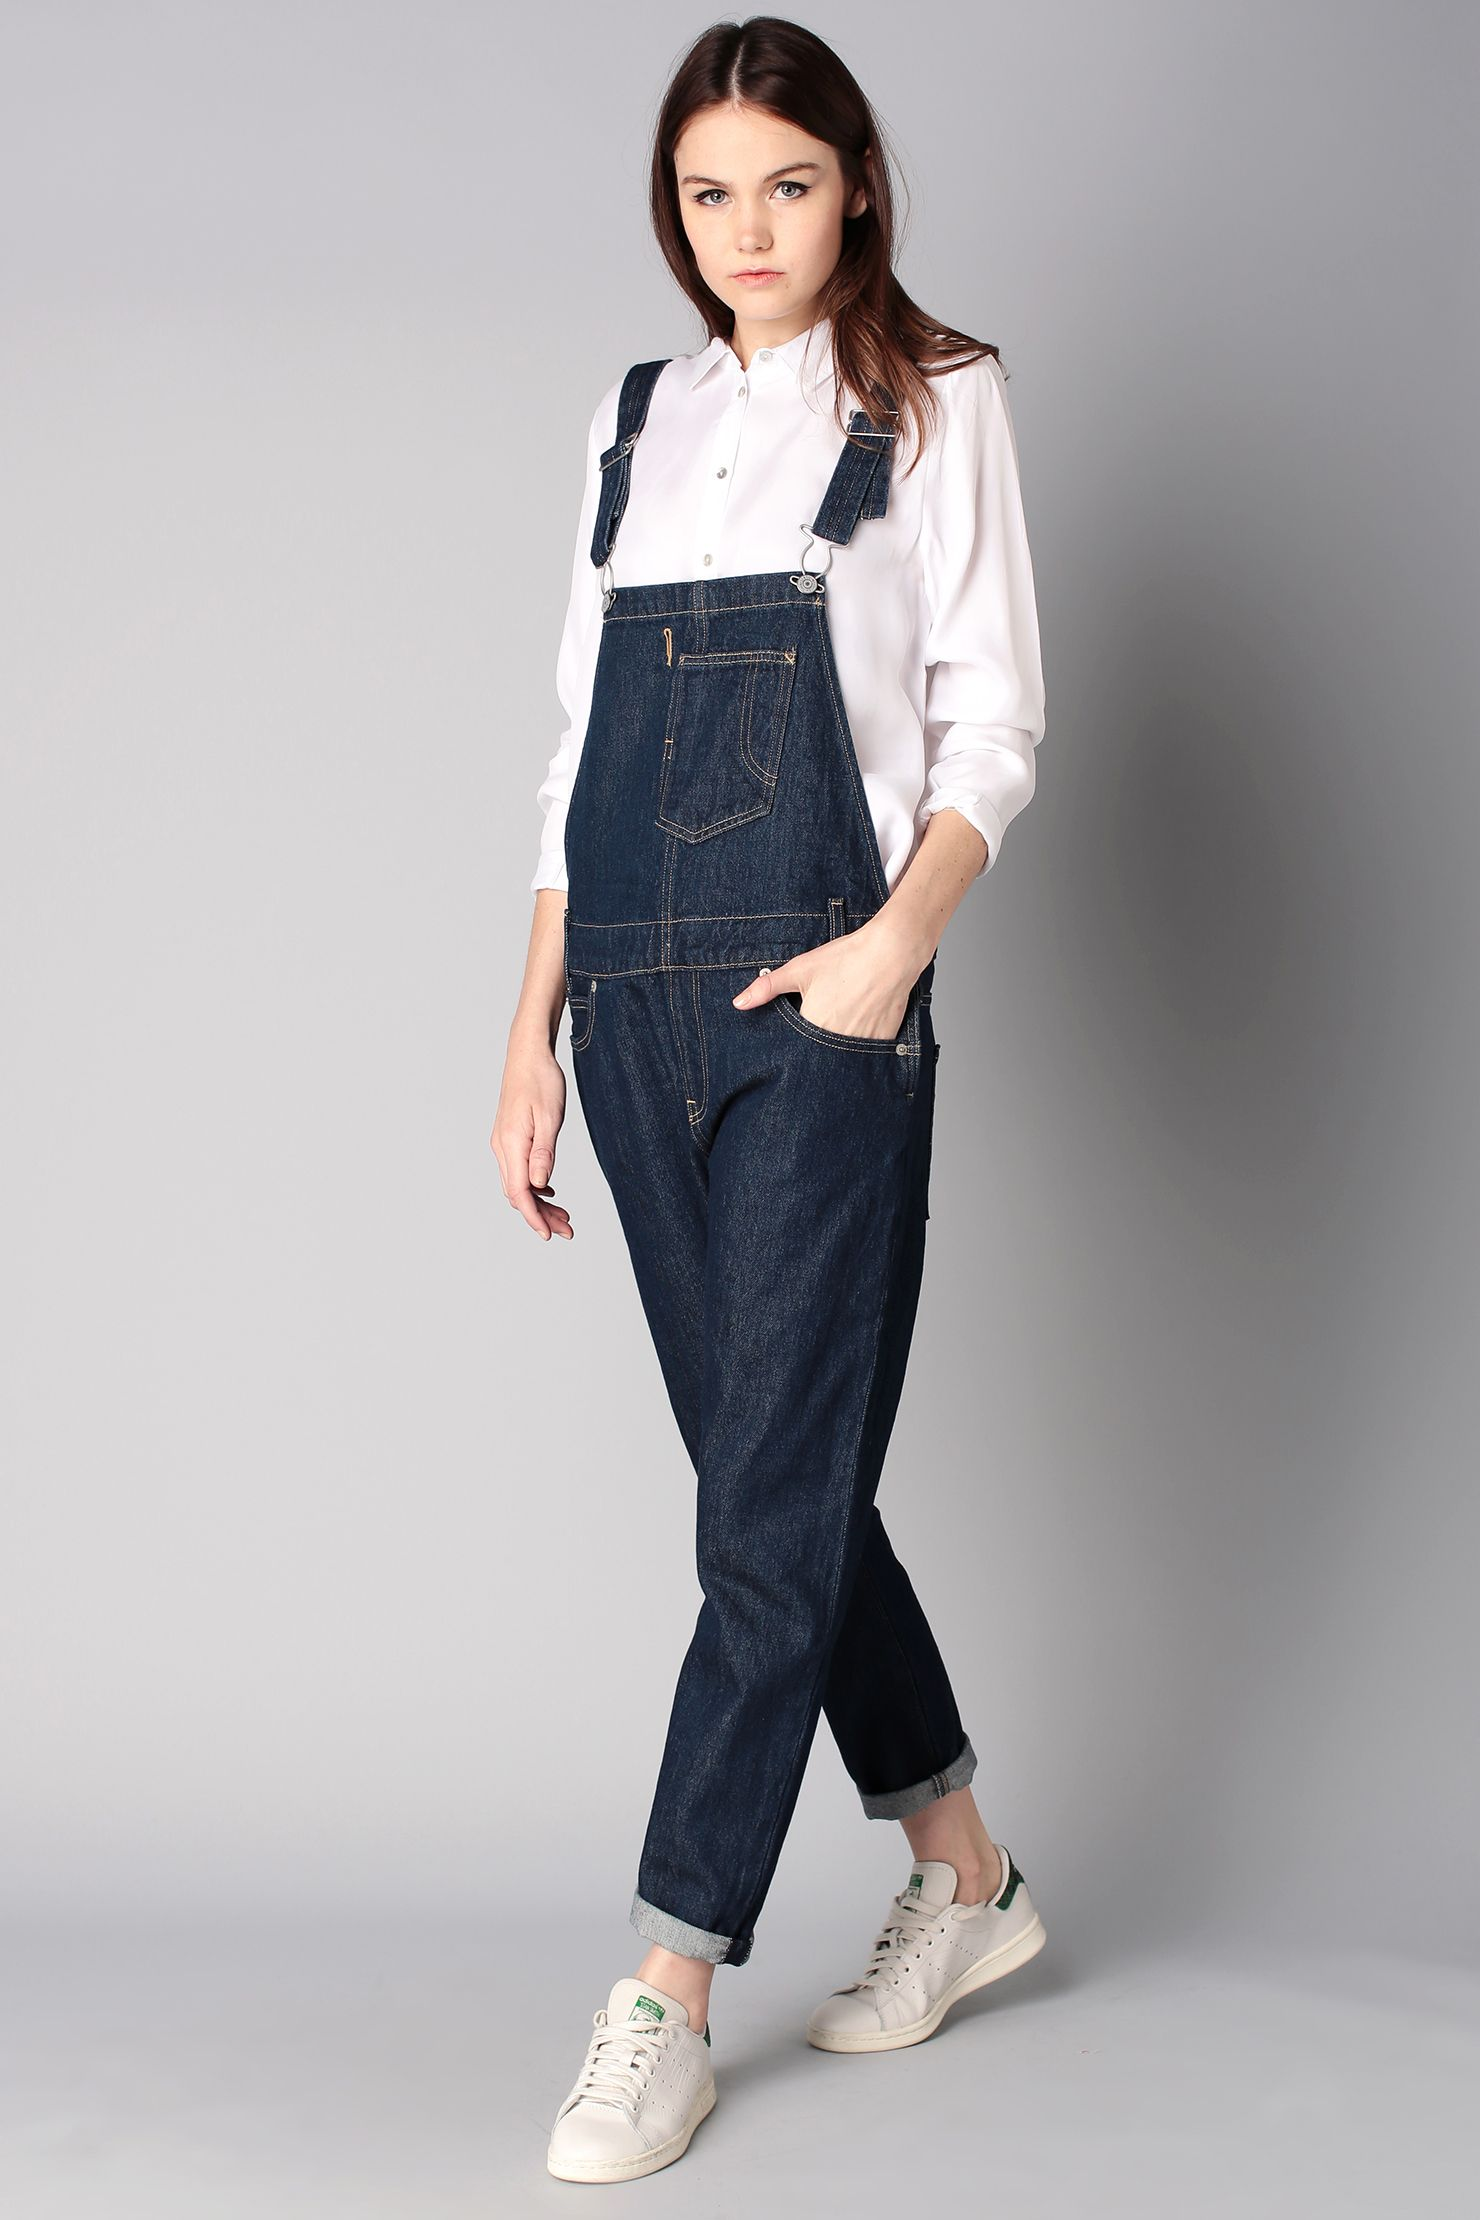 25d780e29b42 Salopette overalls indigo Bleu Levi s sur MonShowroom.com Overalls Fashion